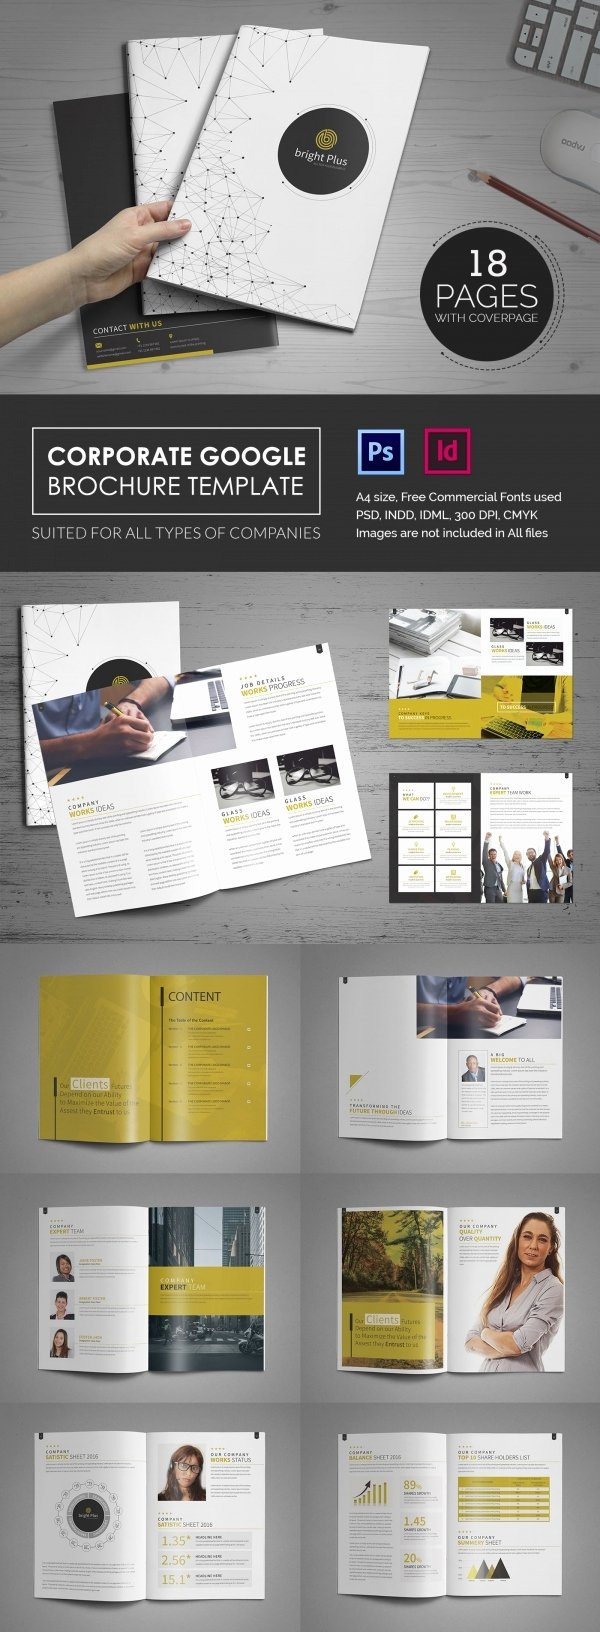 Google Brochure Template Free New 10 Fabulous Google Brochure Templates